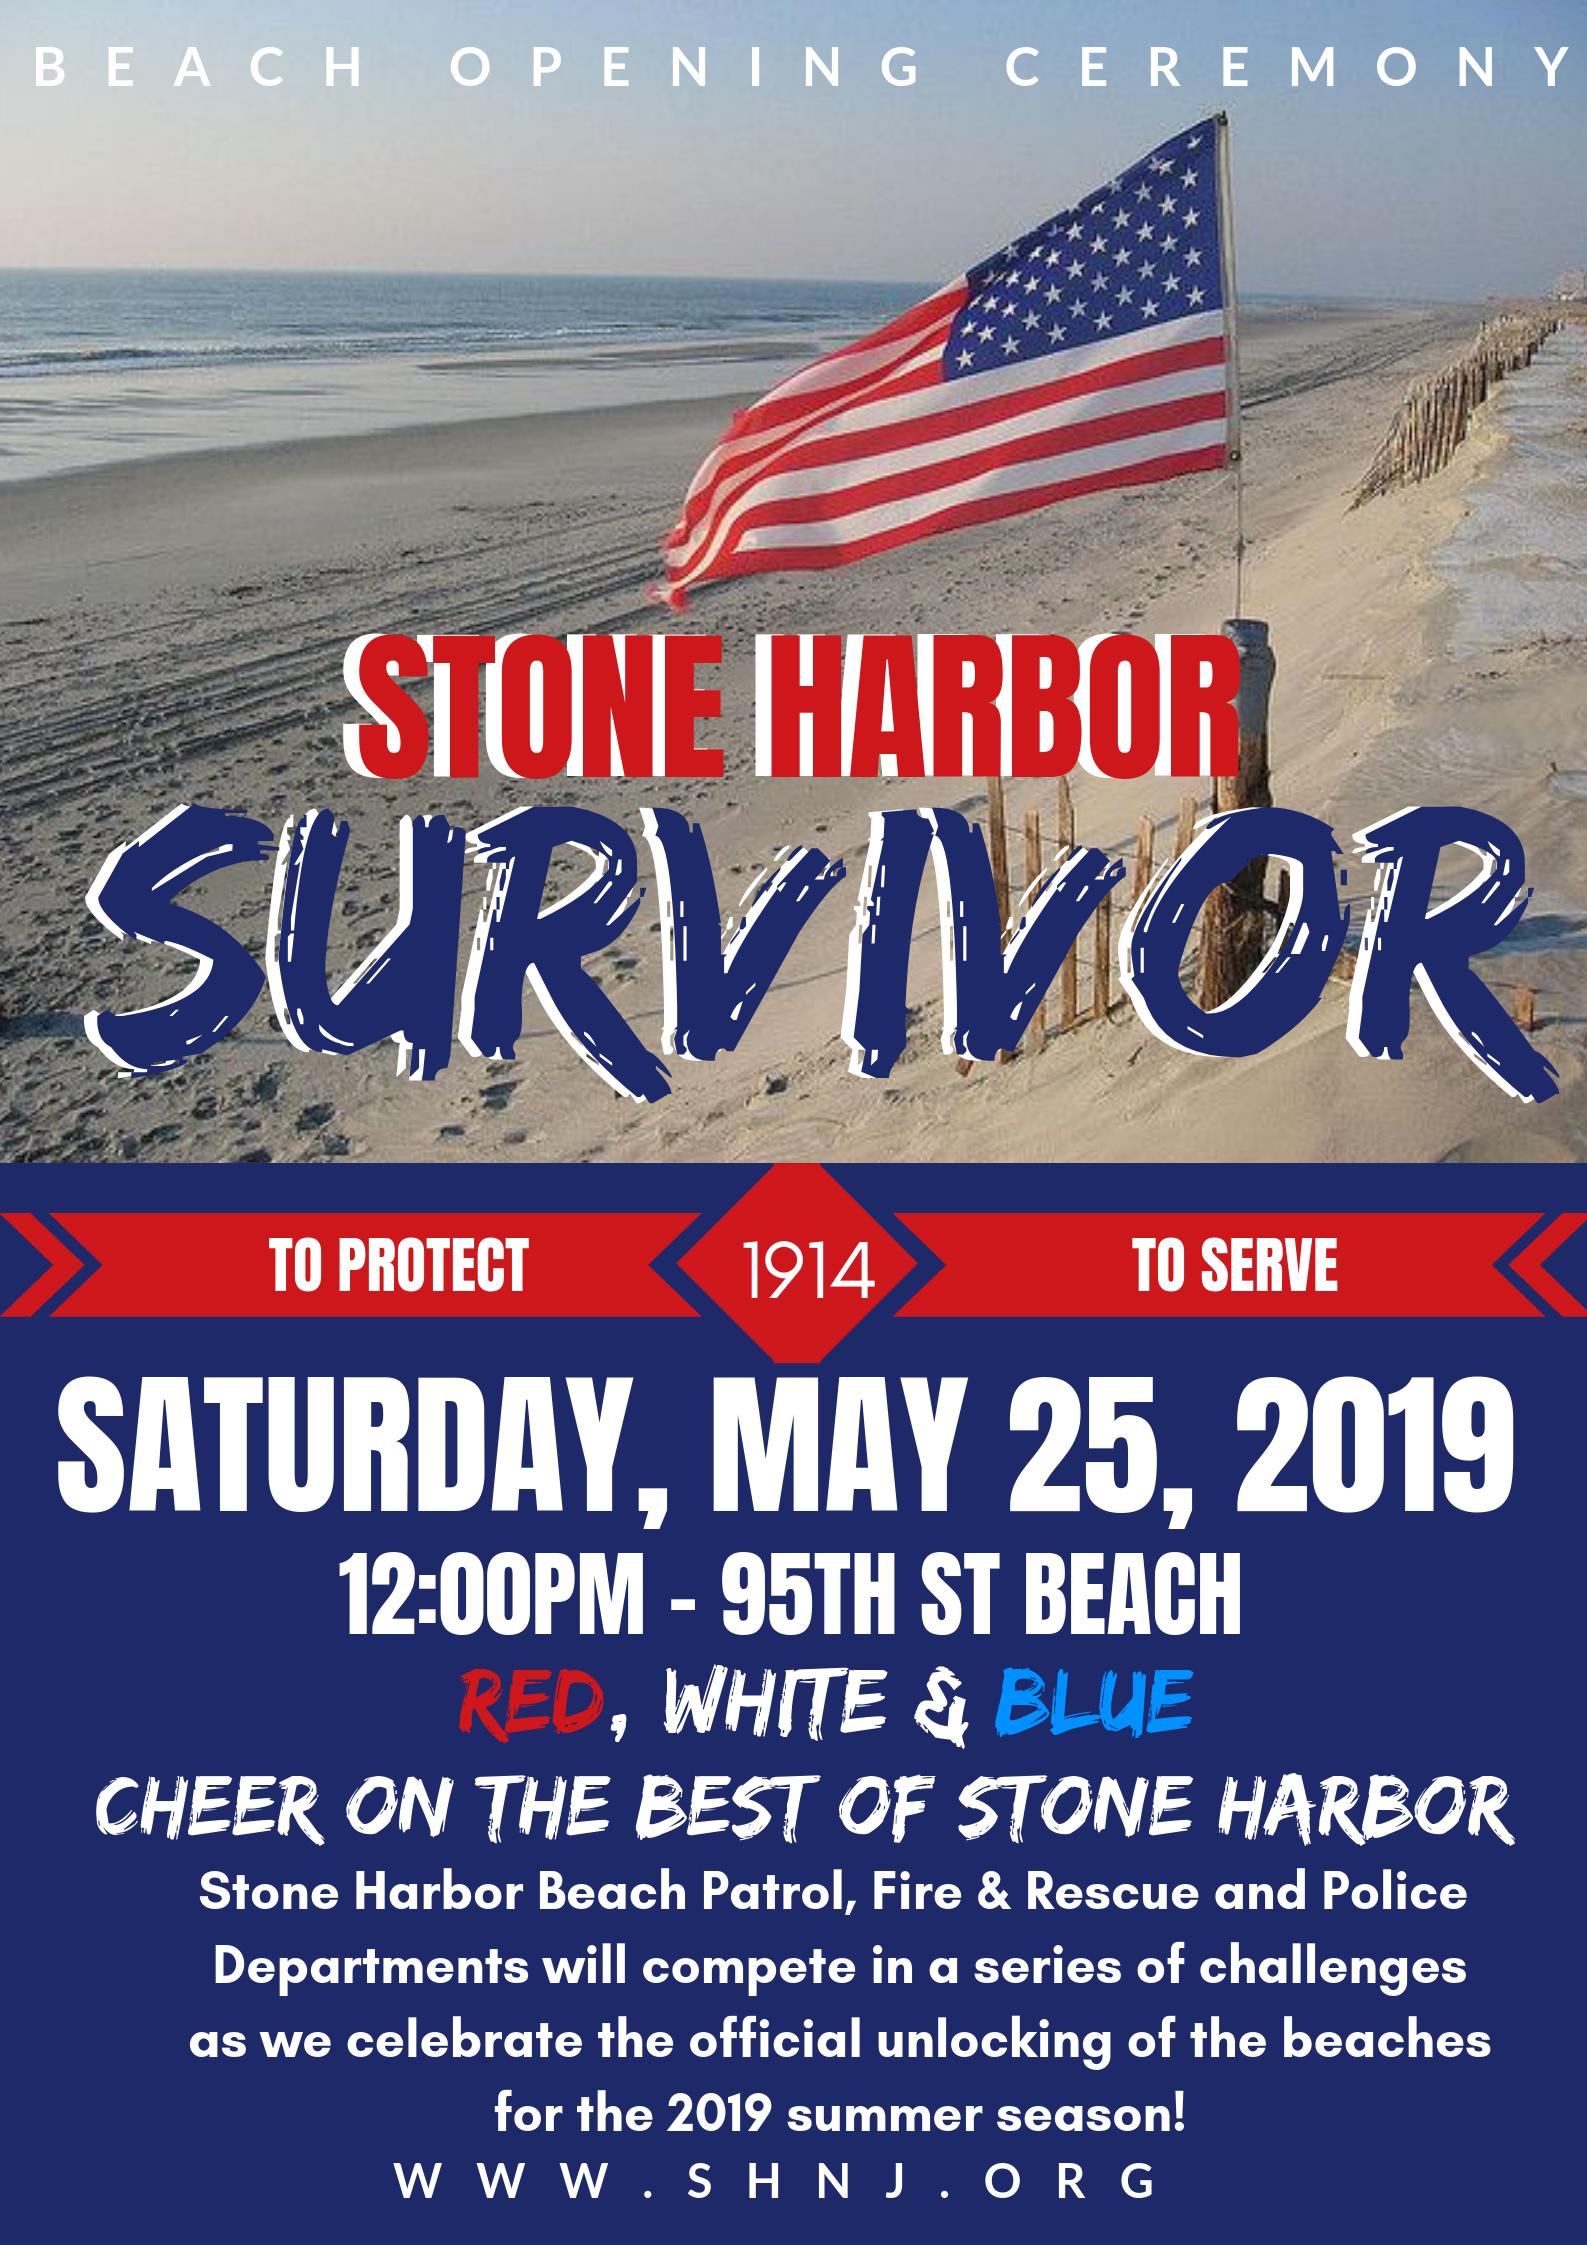 Survivor Stone Harbor: Beach Opening Ceremony